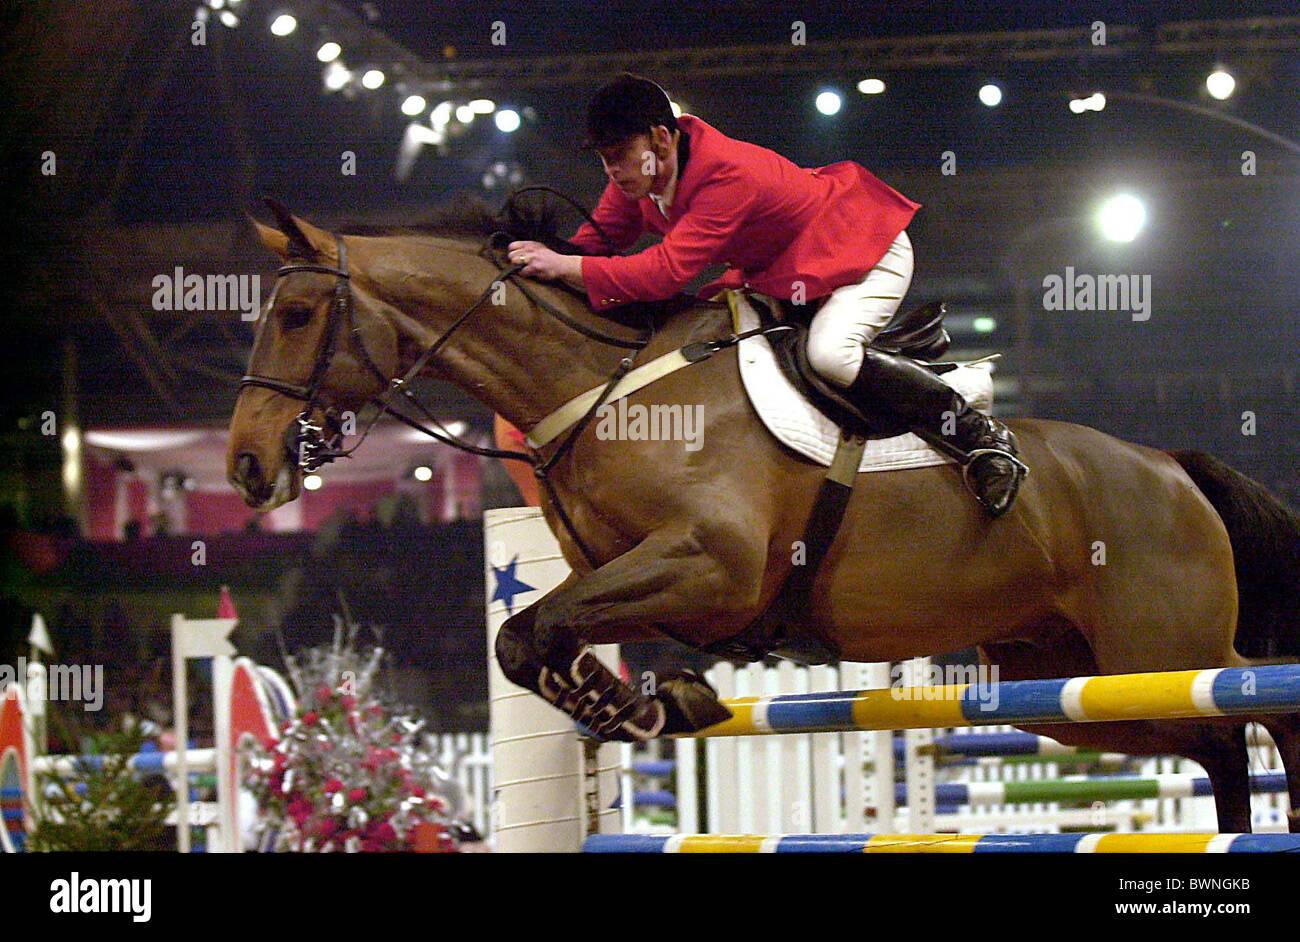 THE INTERNATIONAL SHOWJUMPING CHAMPIONSHIPS AT OLYMPIA, LONDON. - Stock Image